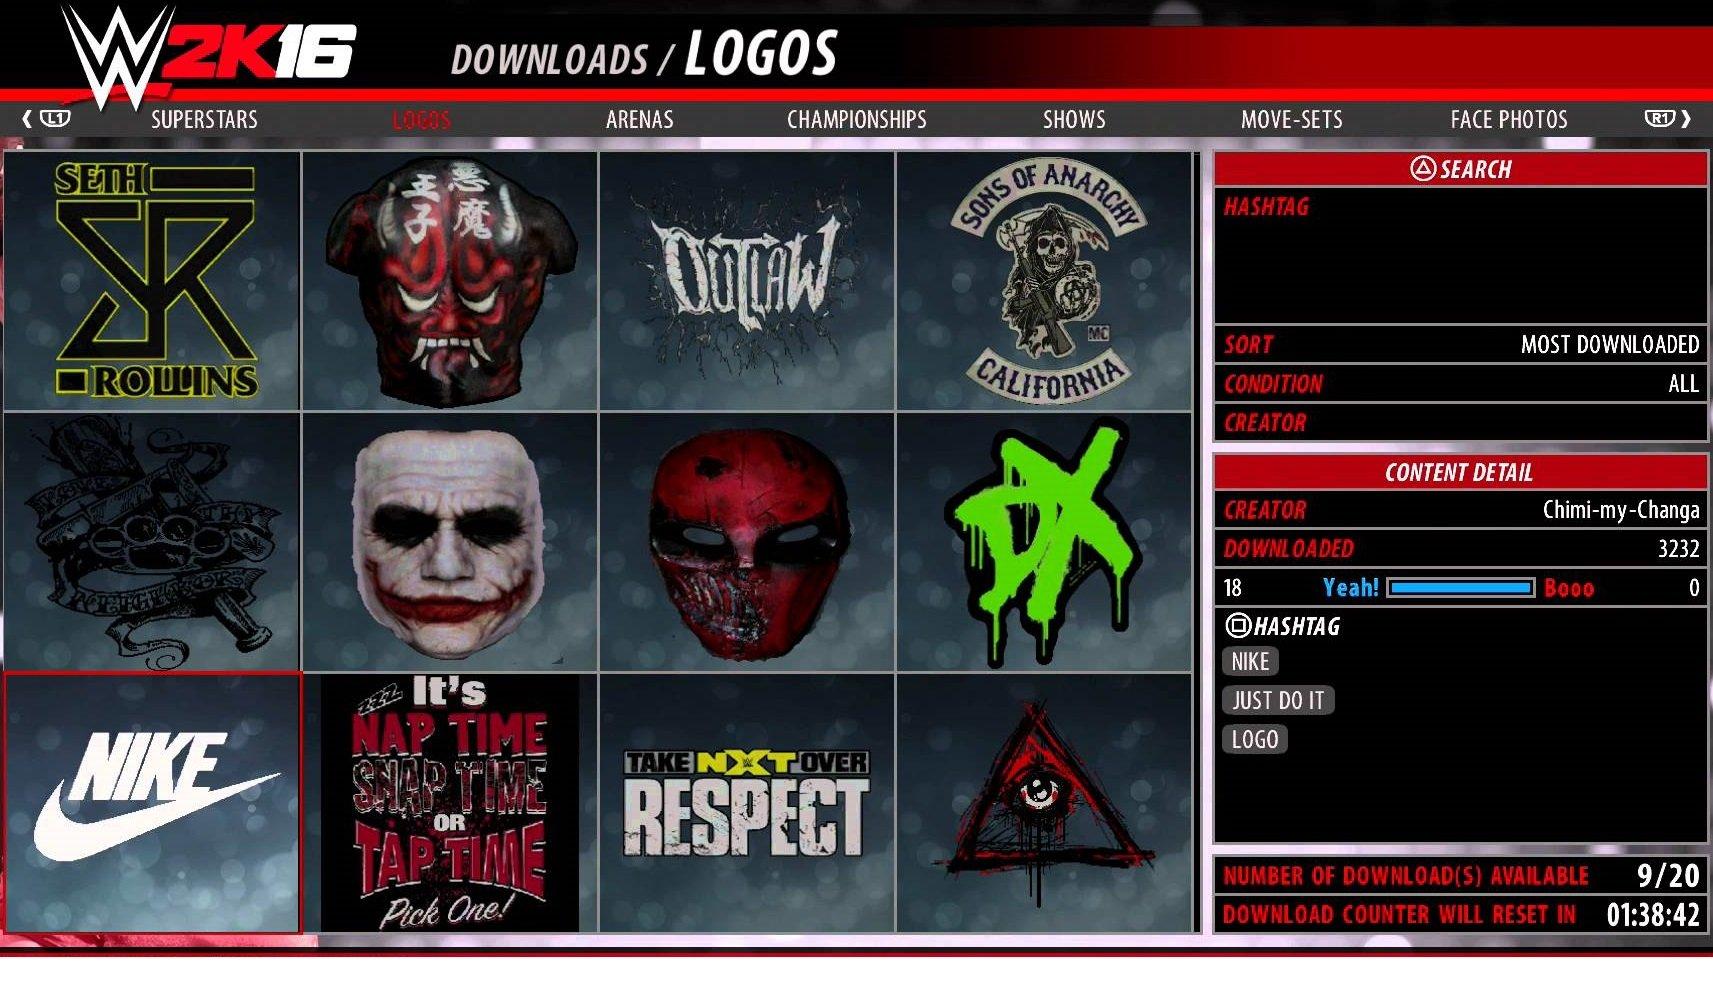 Custom logo uploads (How to).